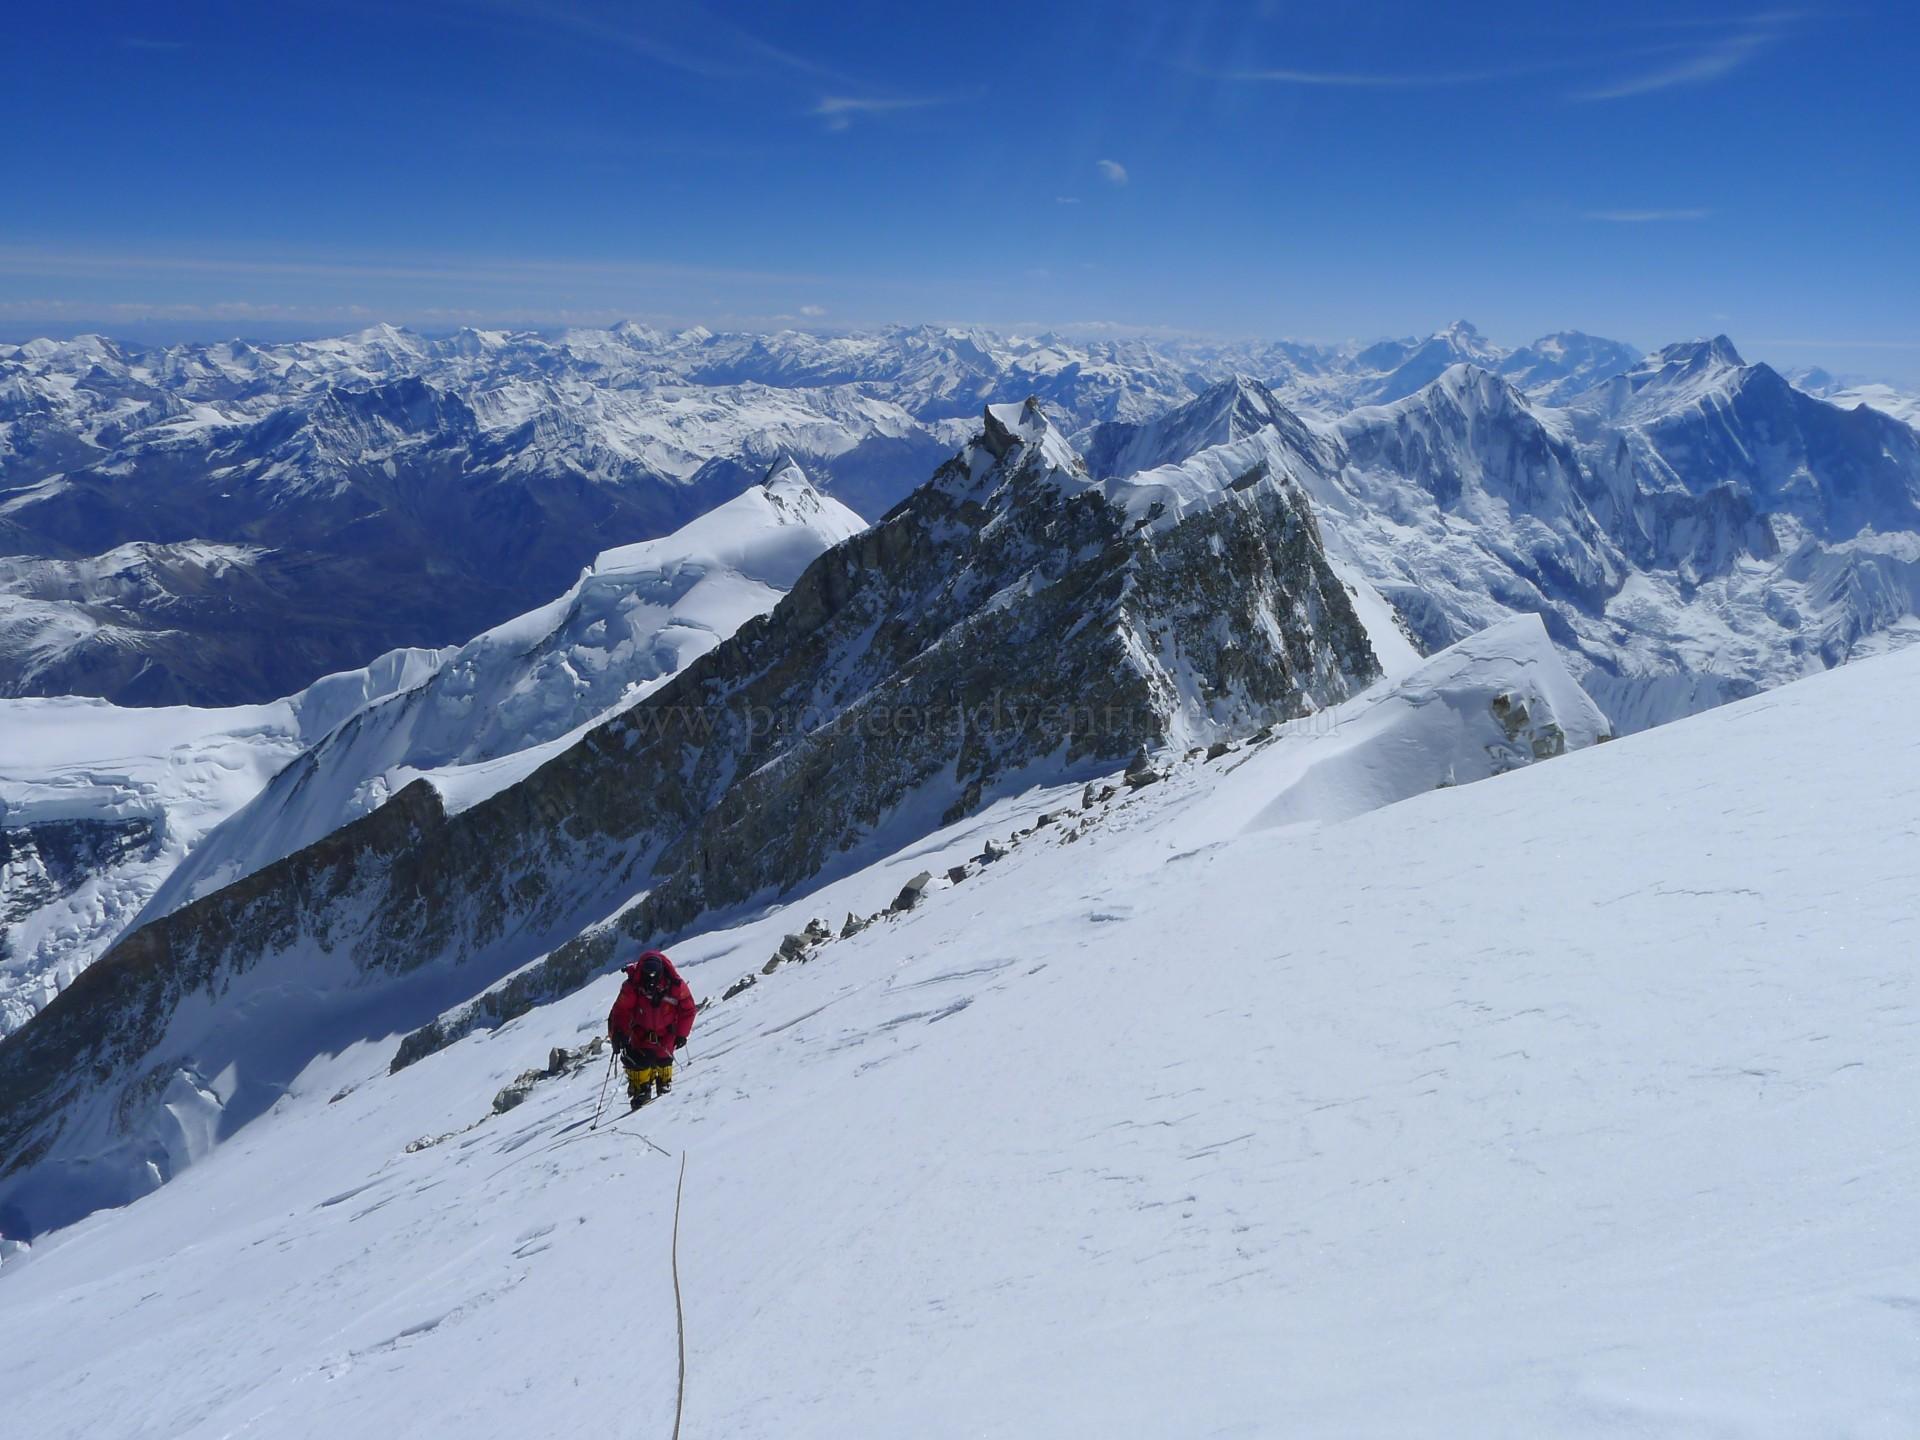 Mt. Annapurna I Expedition